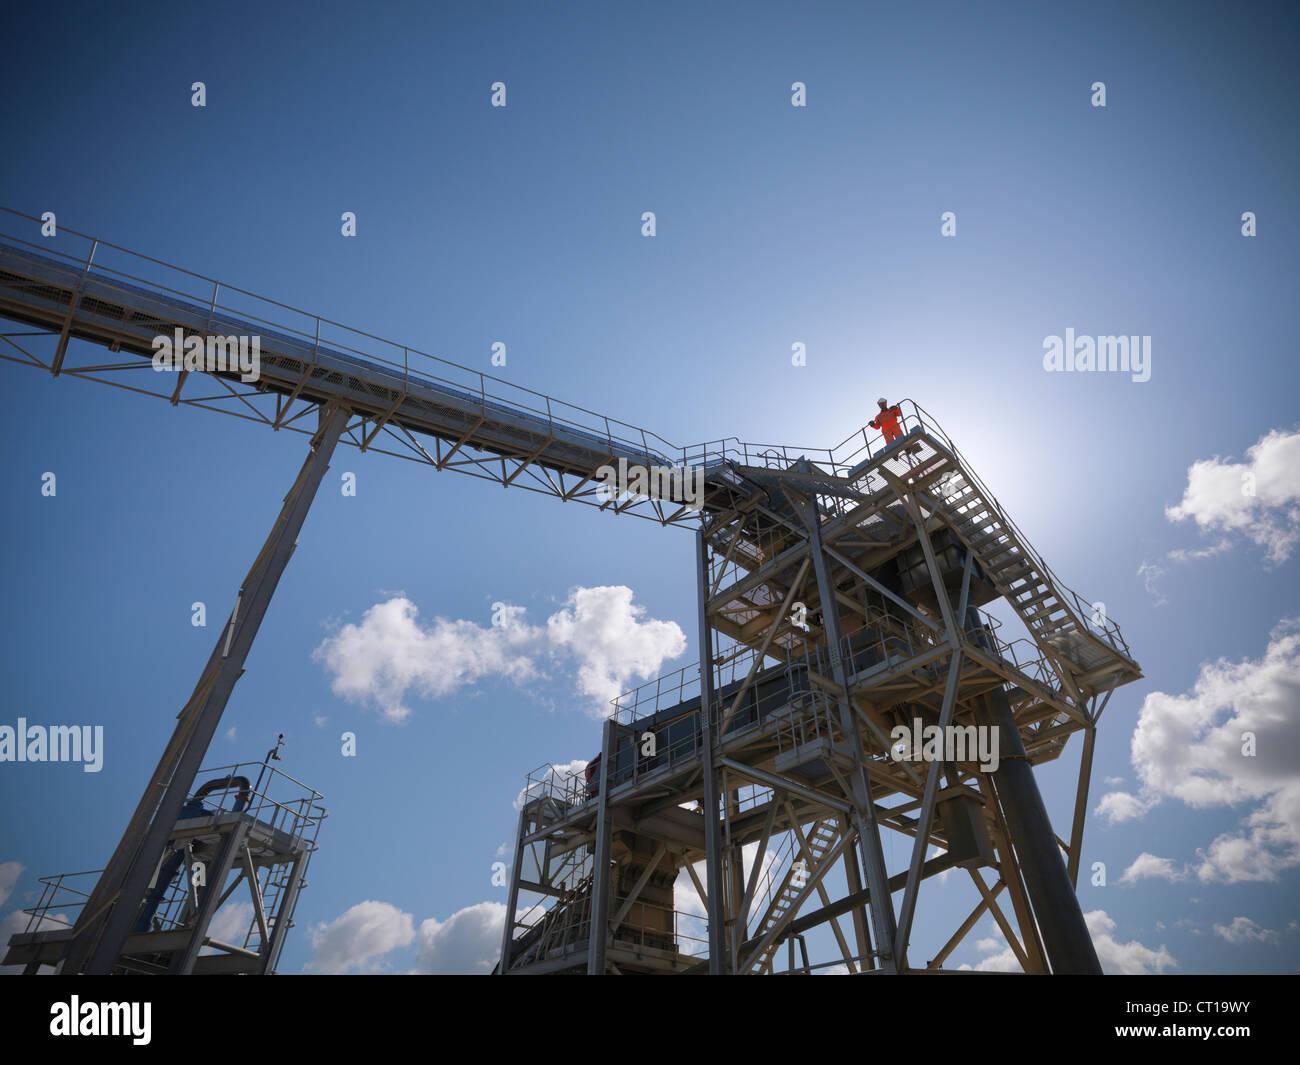 Worker convoyeur en carrière Photo Stock